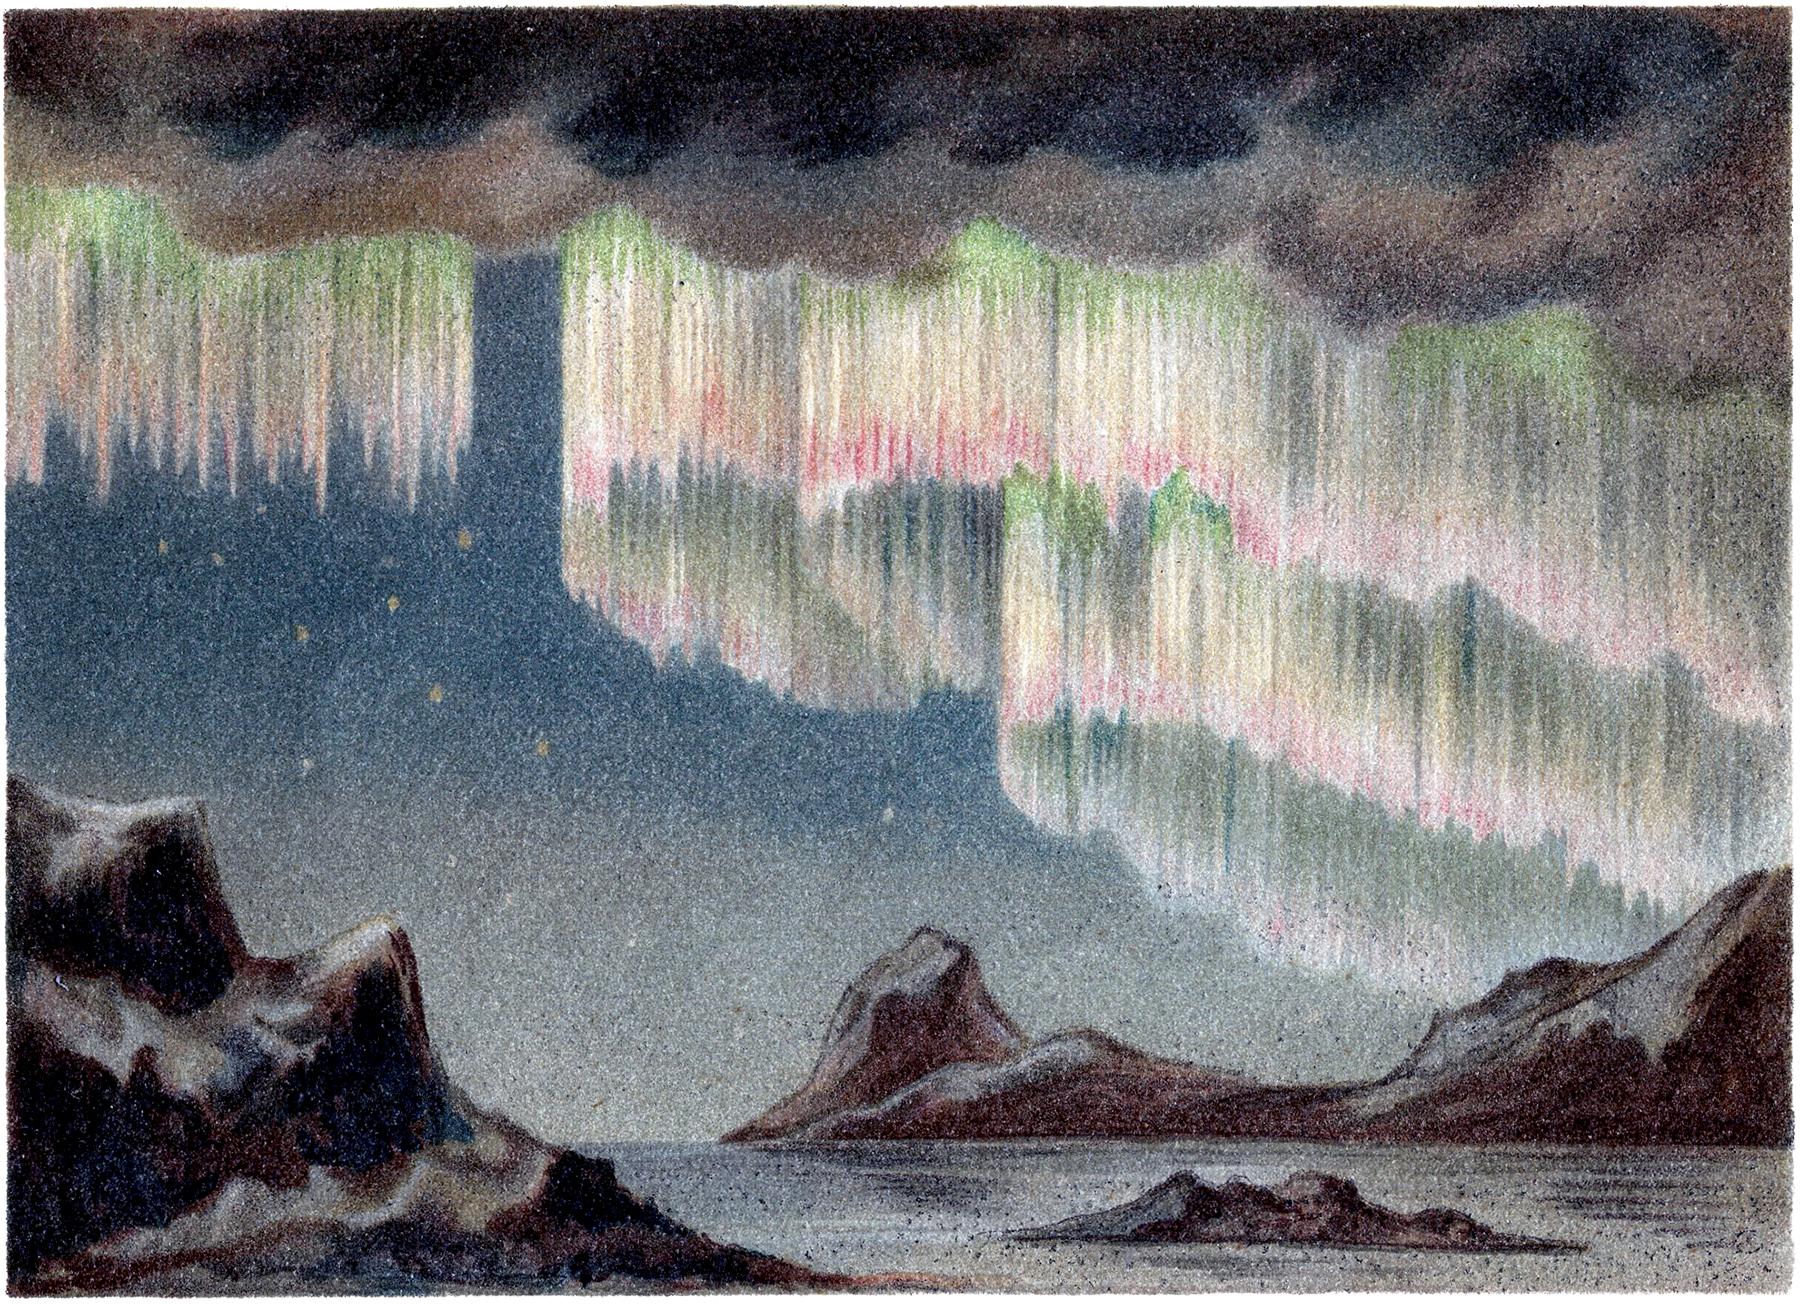 Polar Lights Clip Art Aurora Borealis The Graphics Fairy